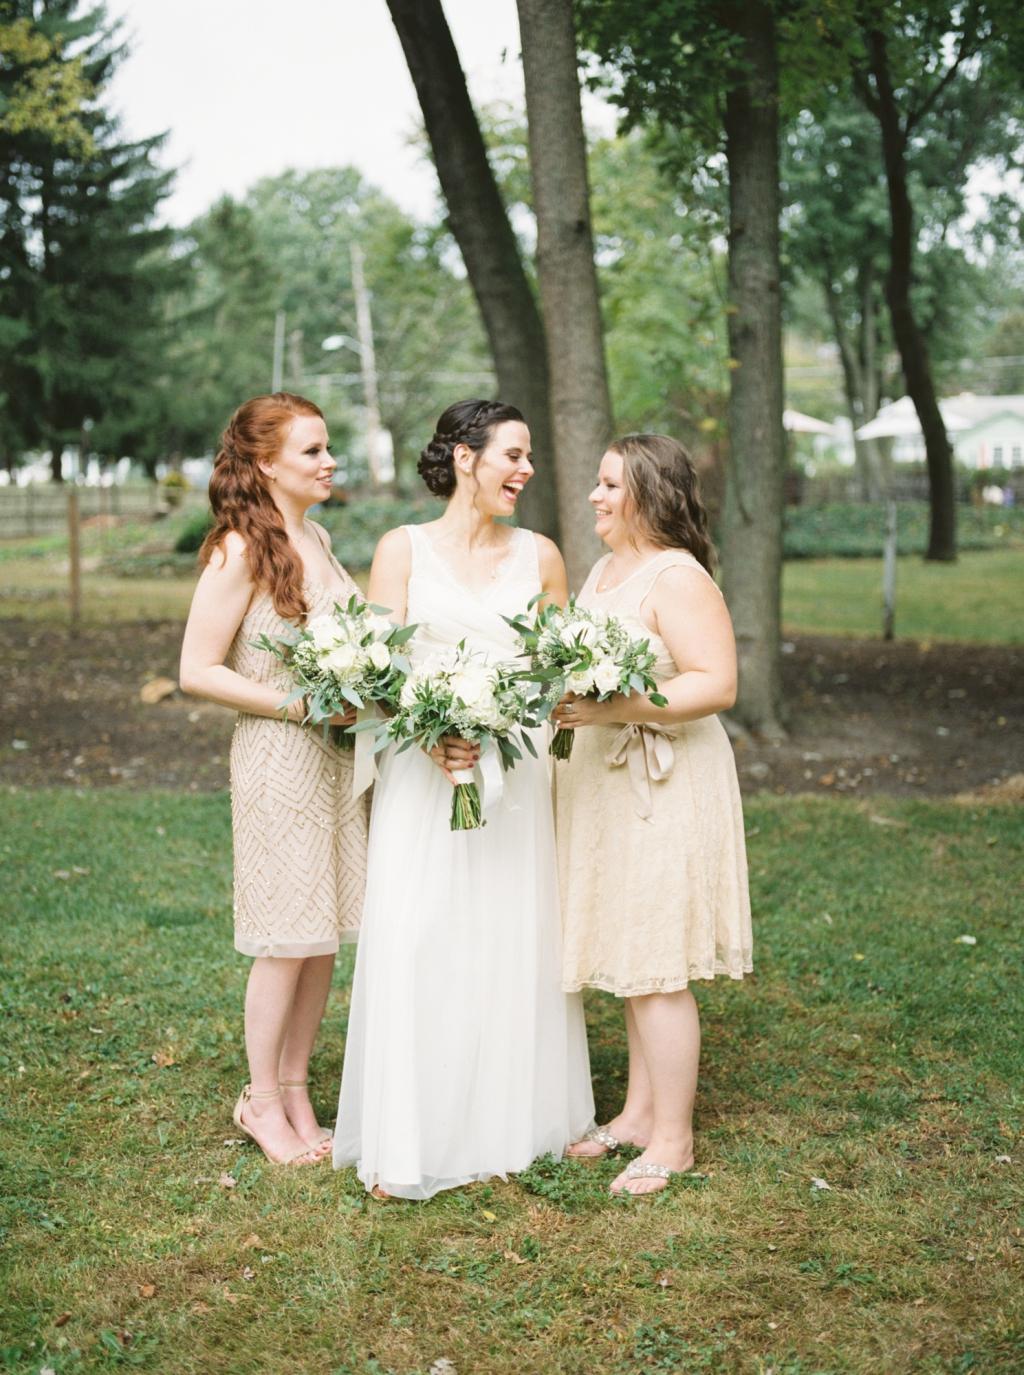 haley-richter-photography-new-jersey-backyard-wedding-208